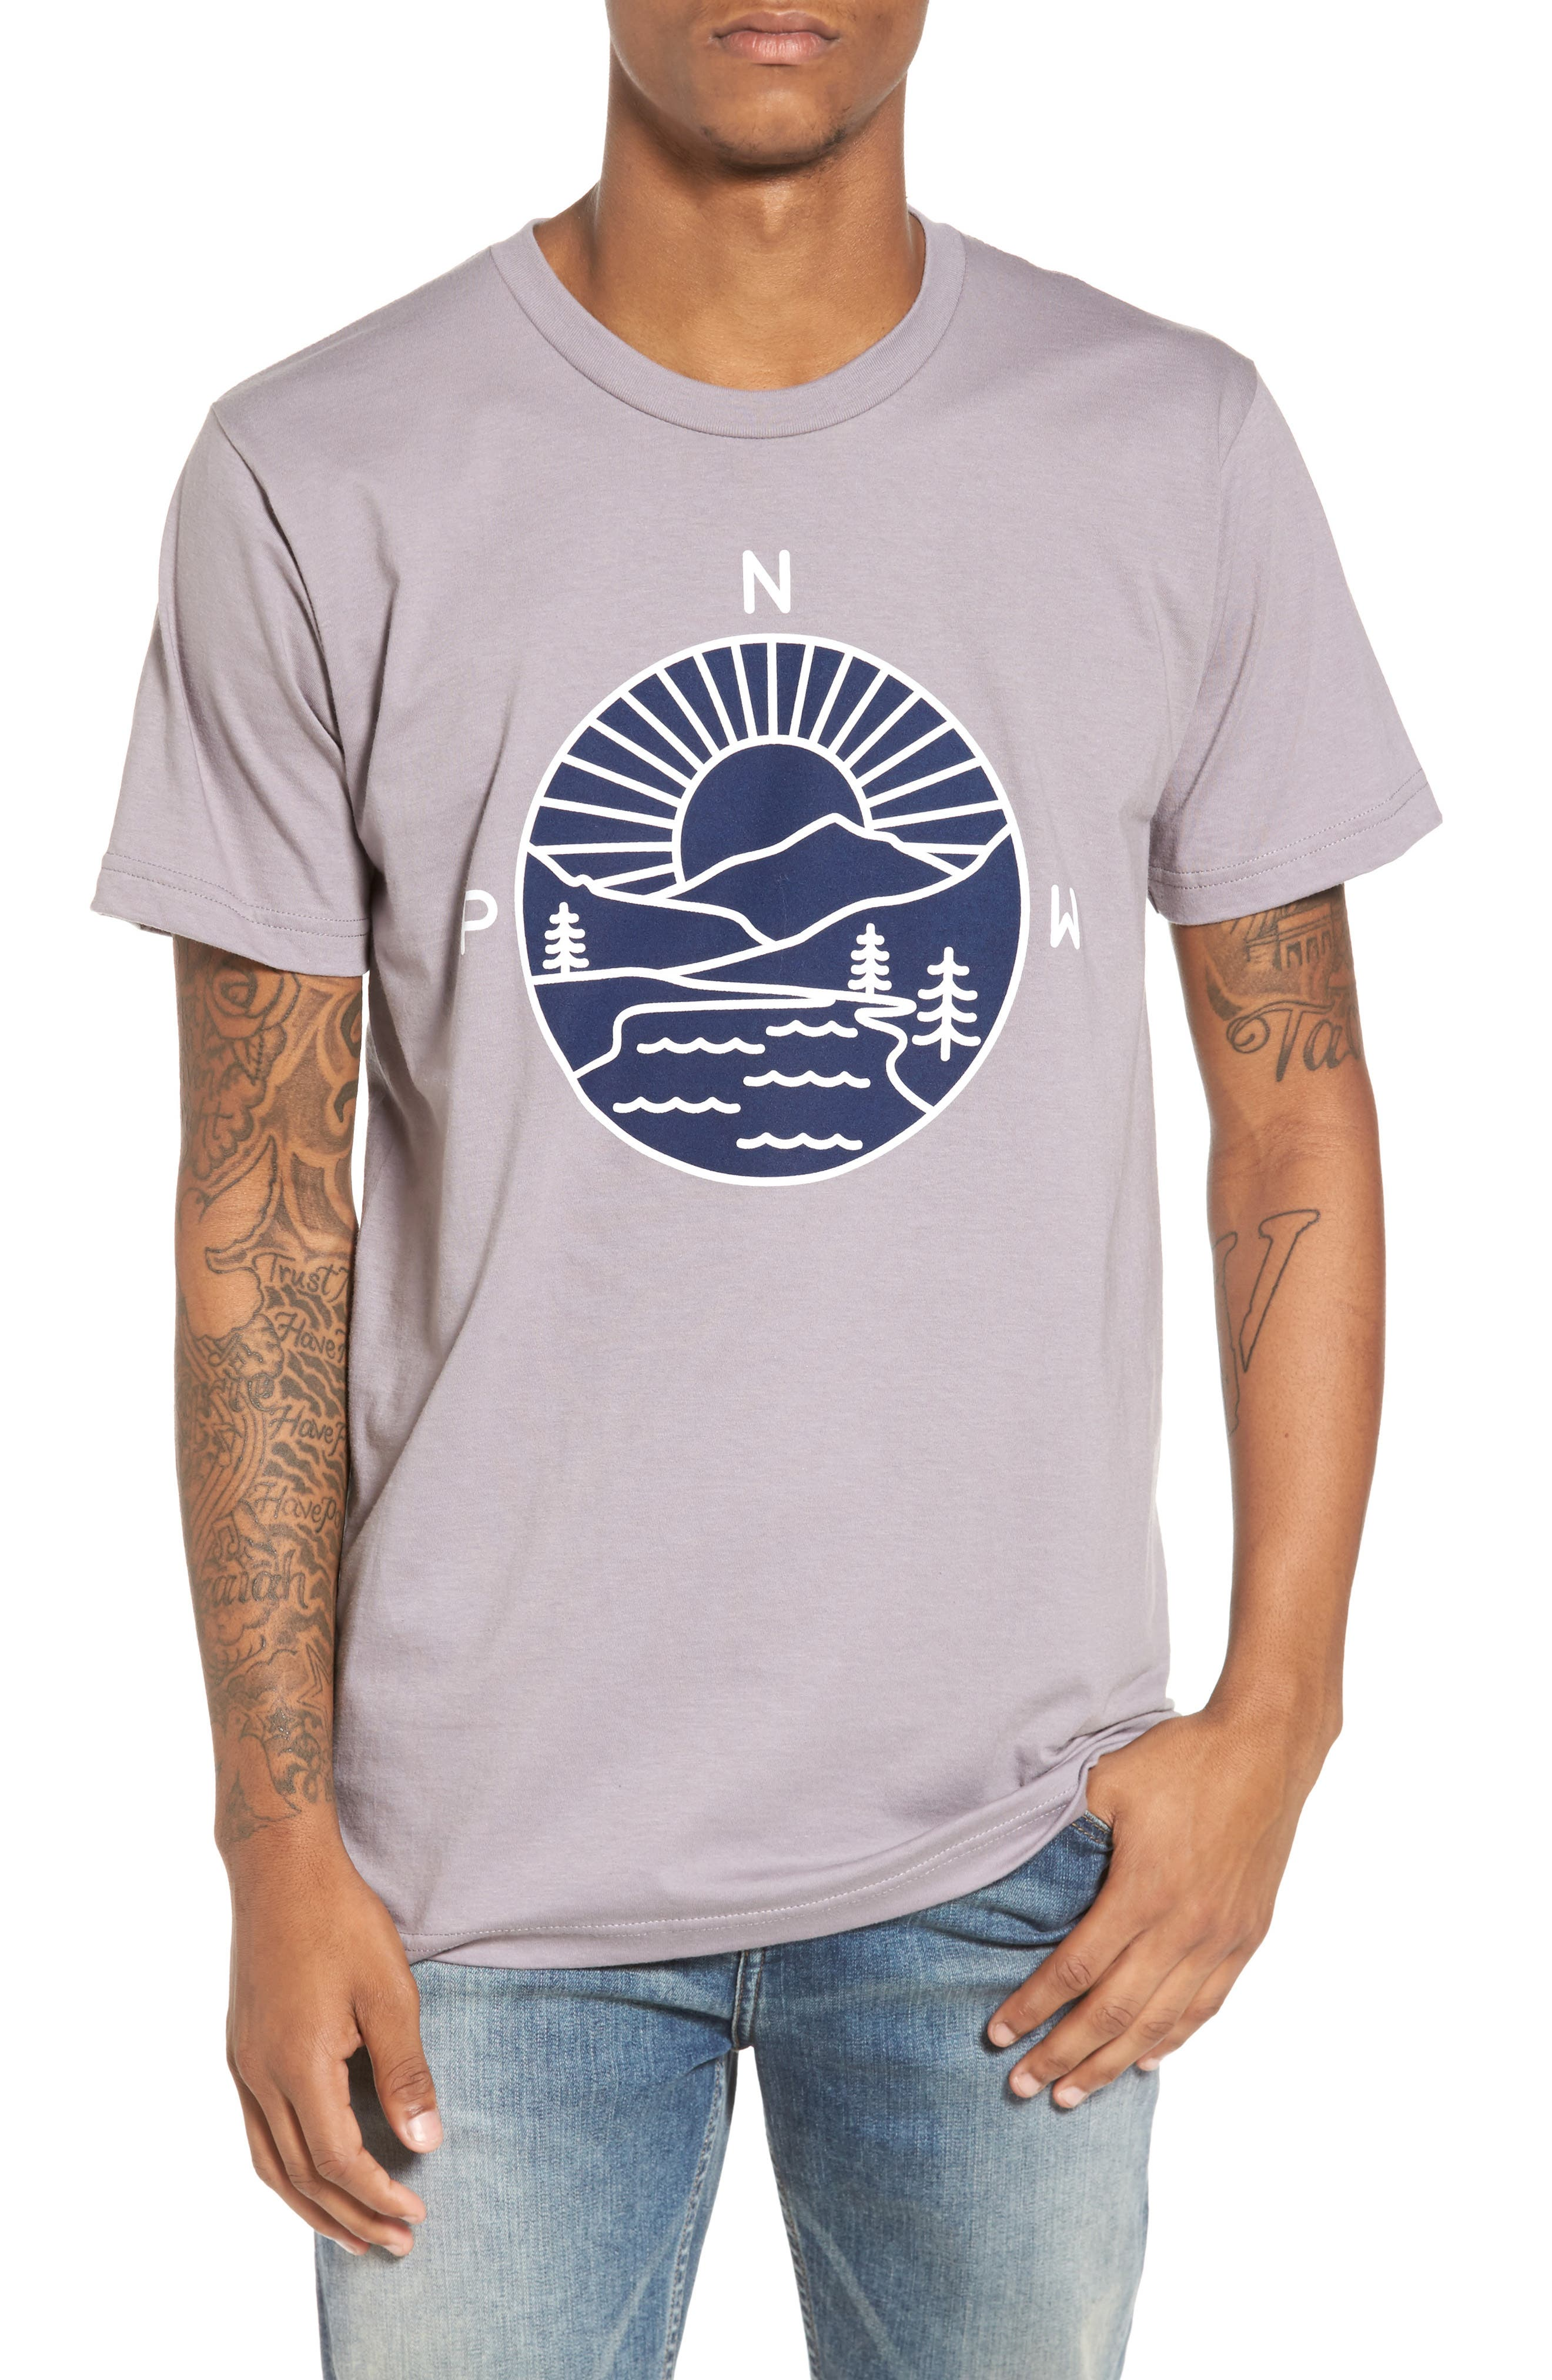 Alternate Image 1 Selected - Casual Industrees PNW Explorer T-Shirt